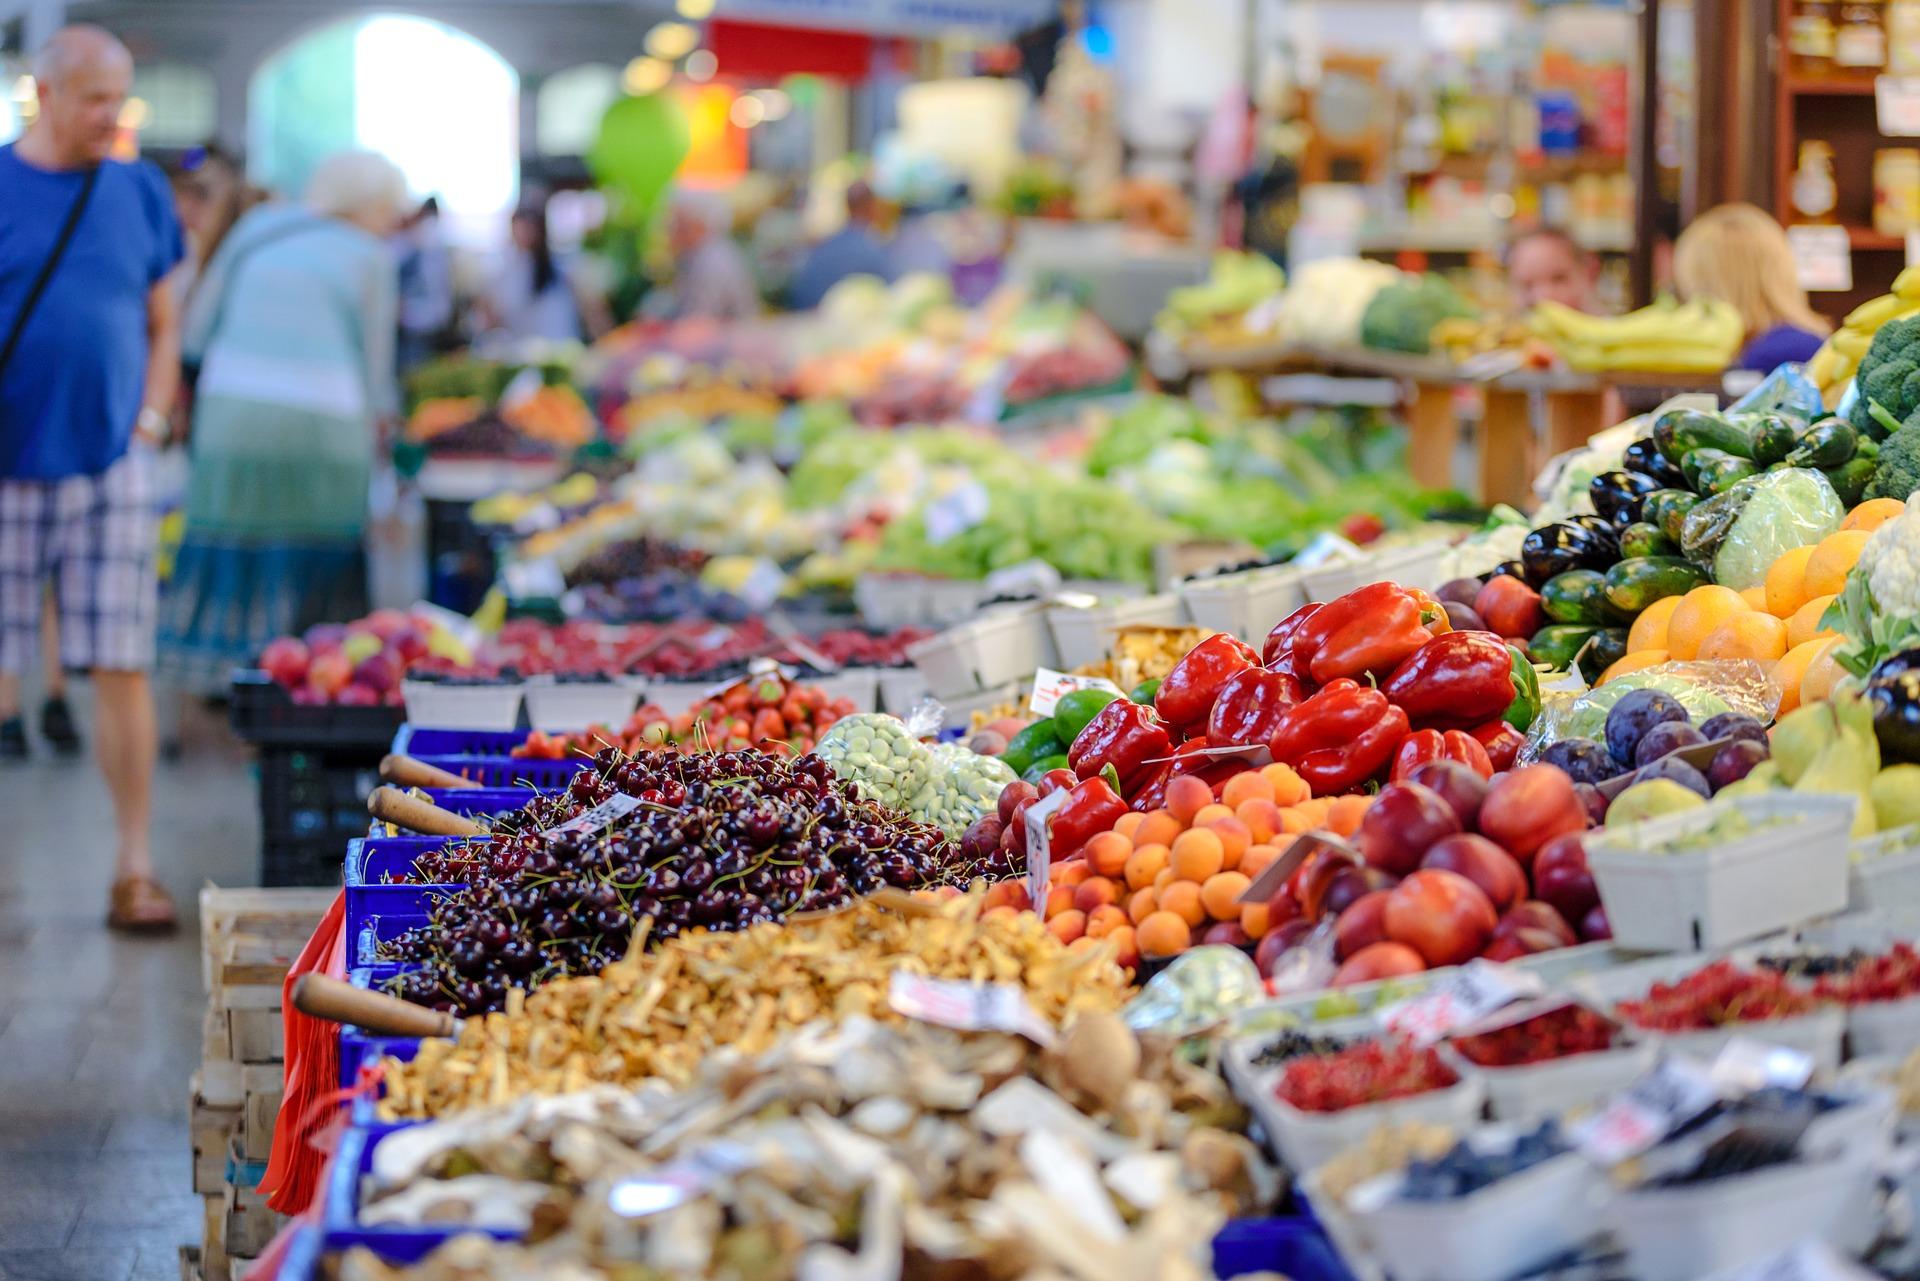 CalFresh groceries